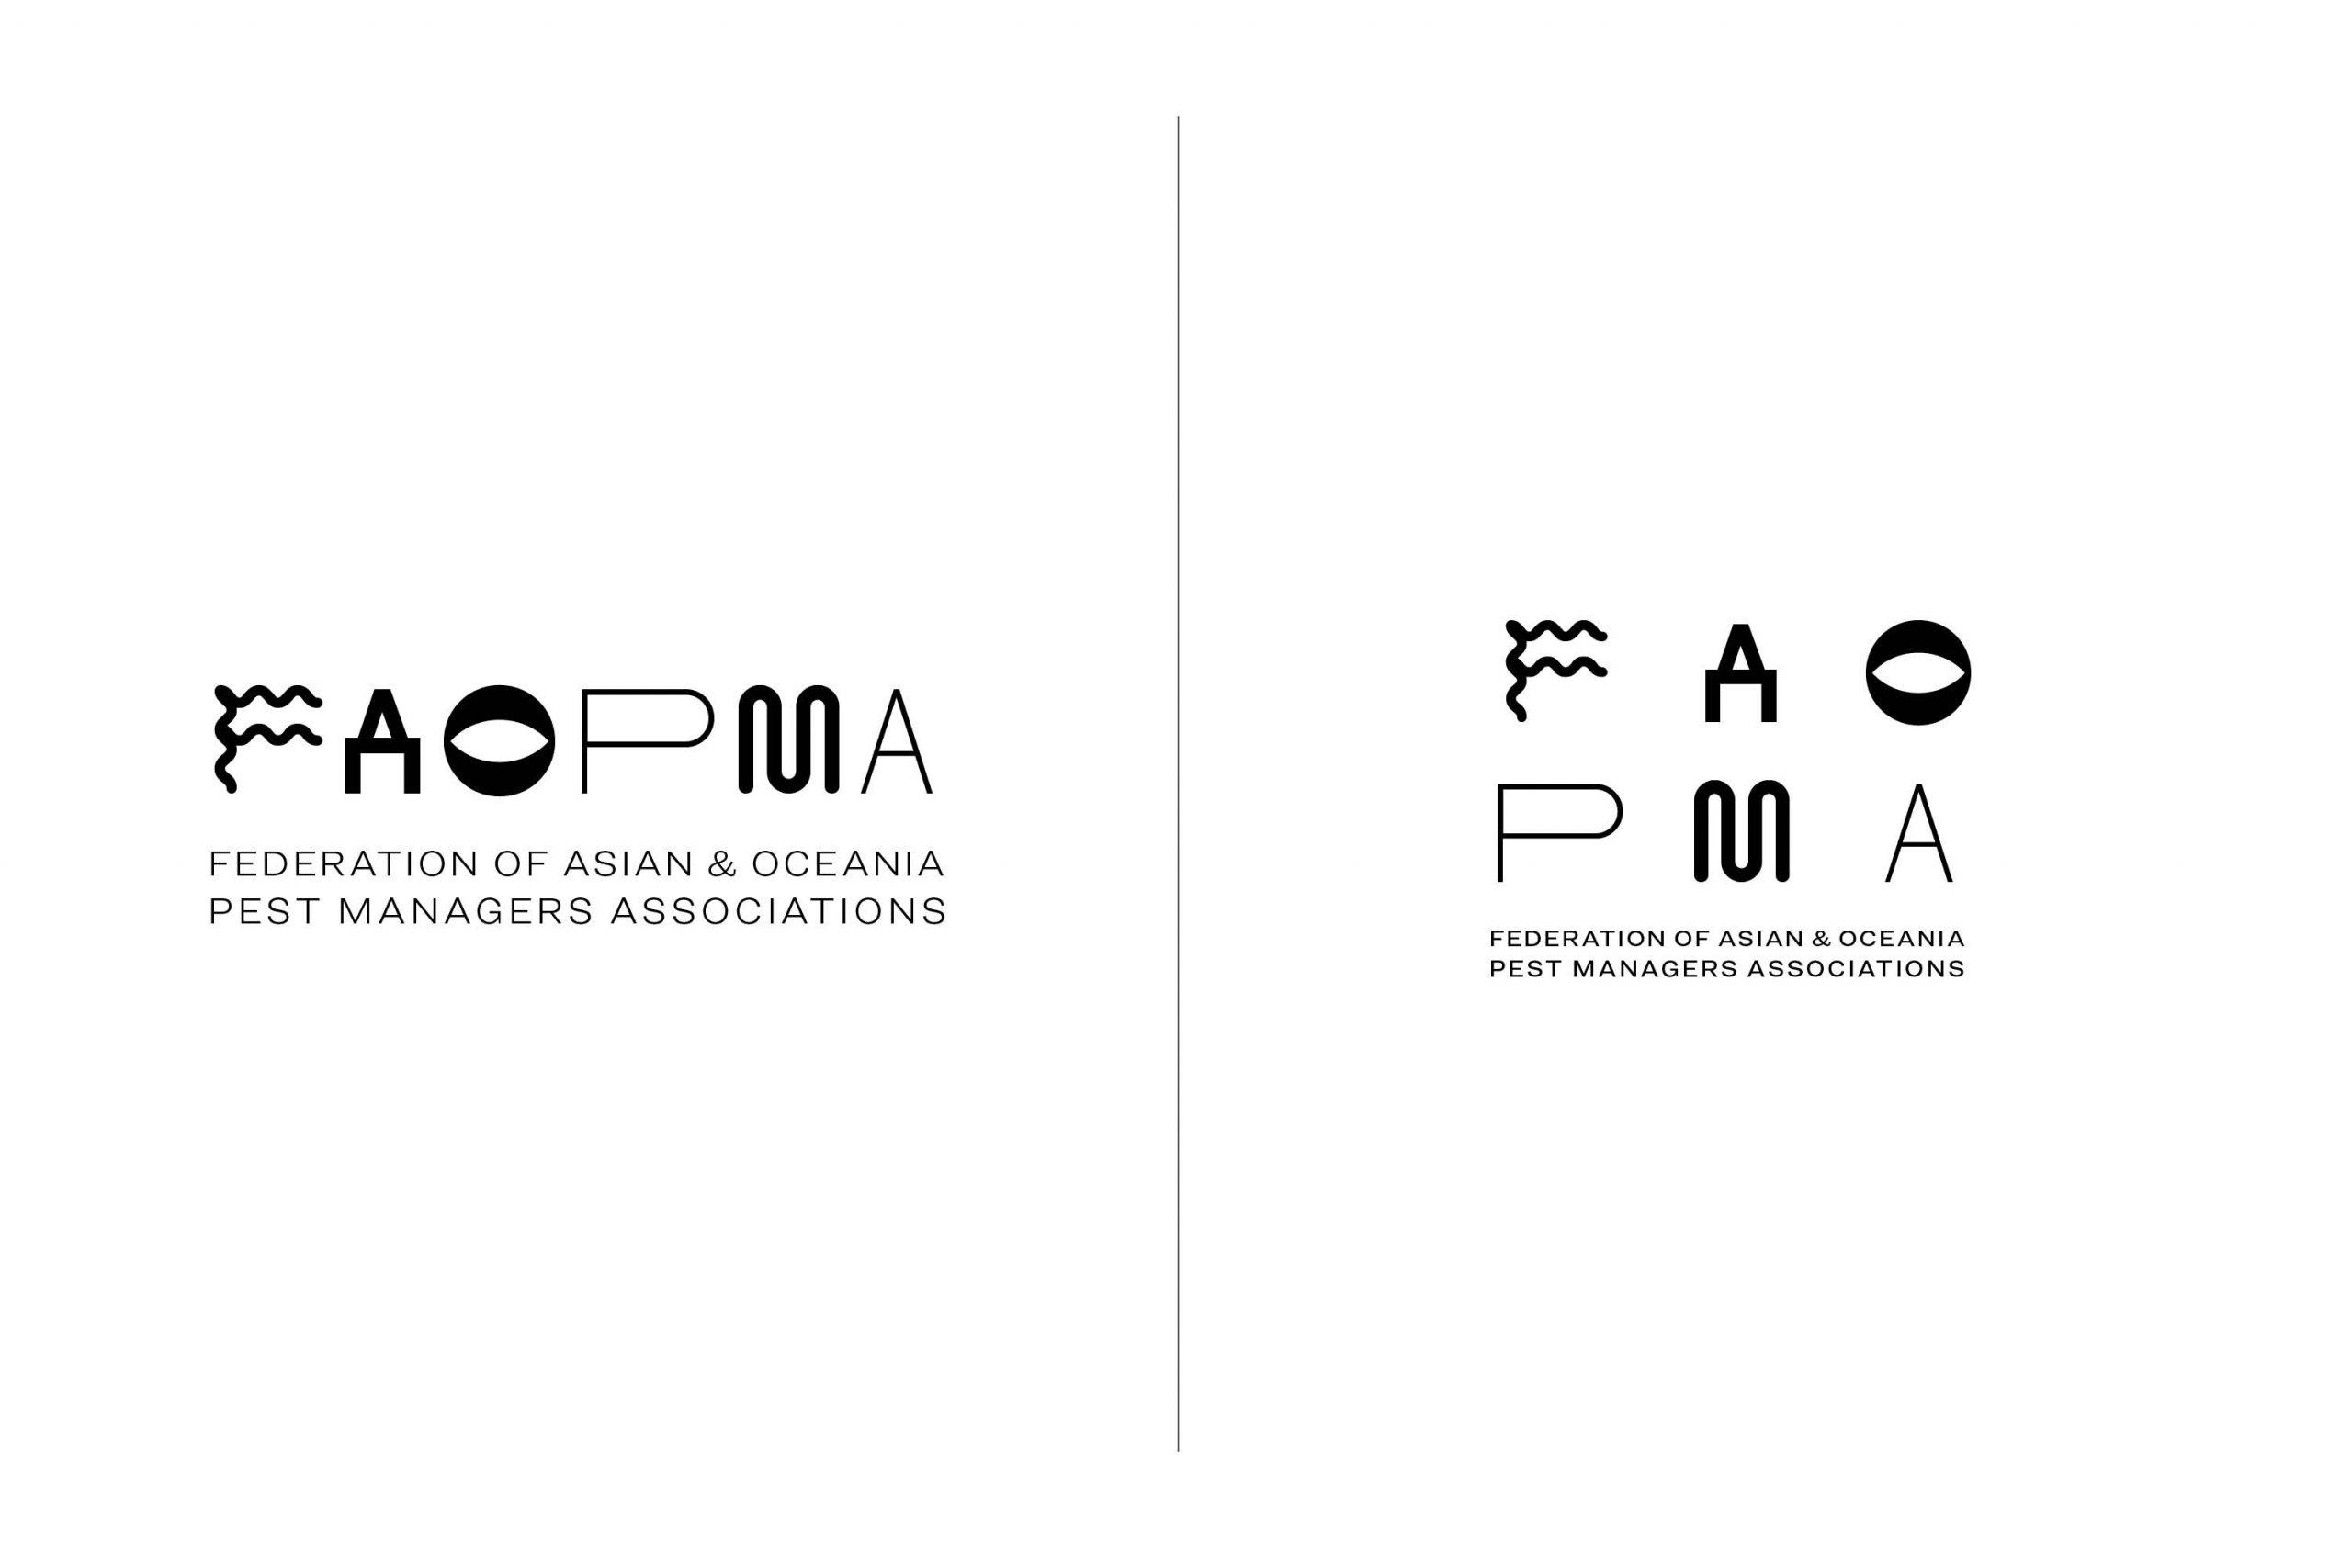 HAO-FAOPMA5